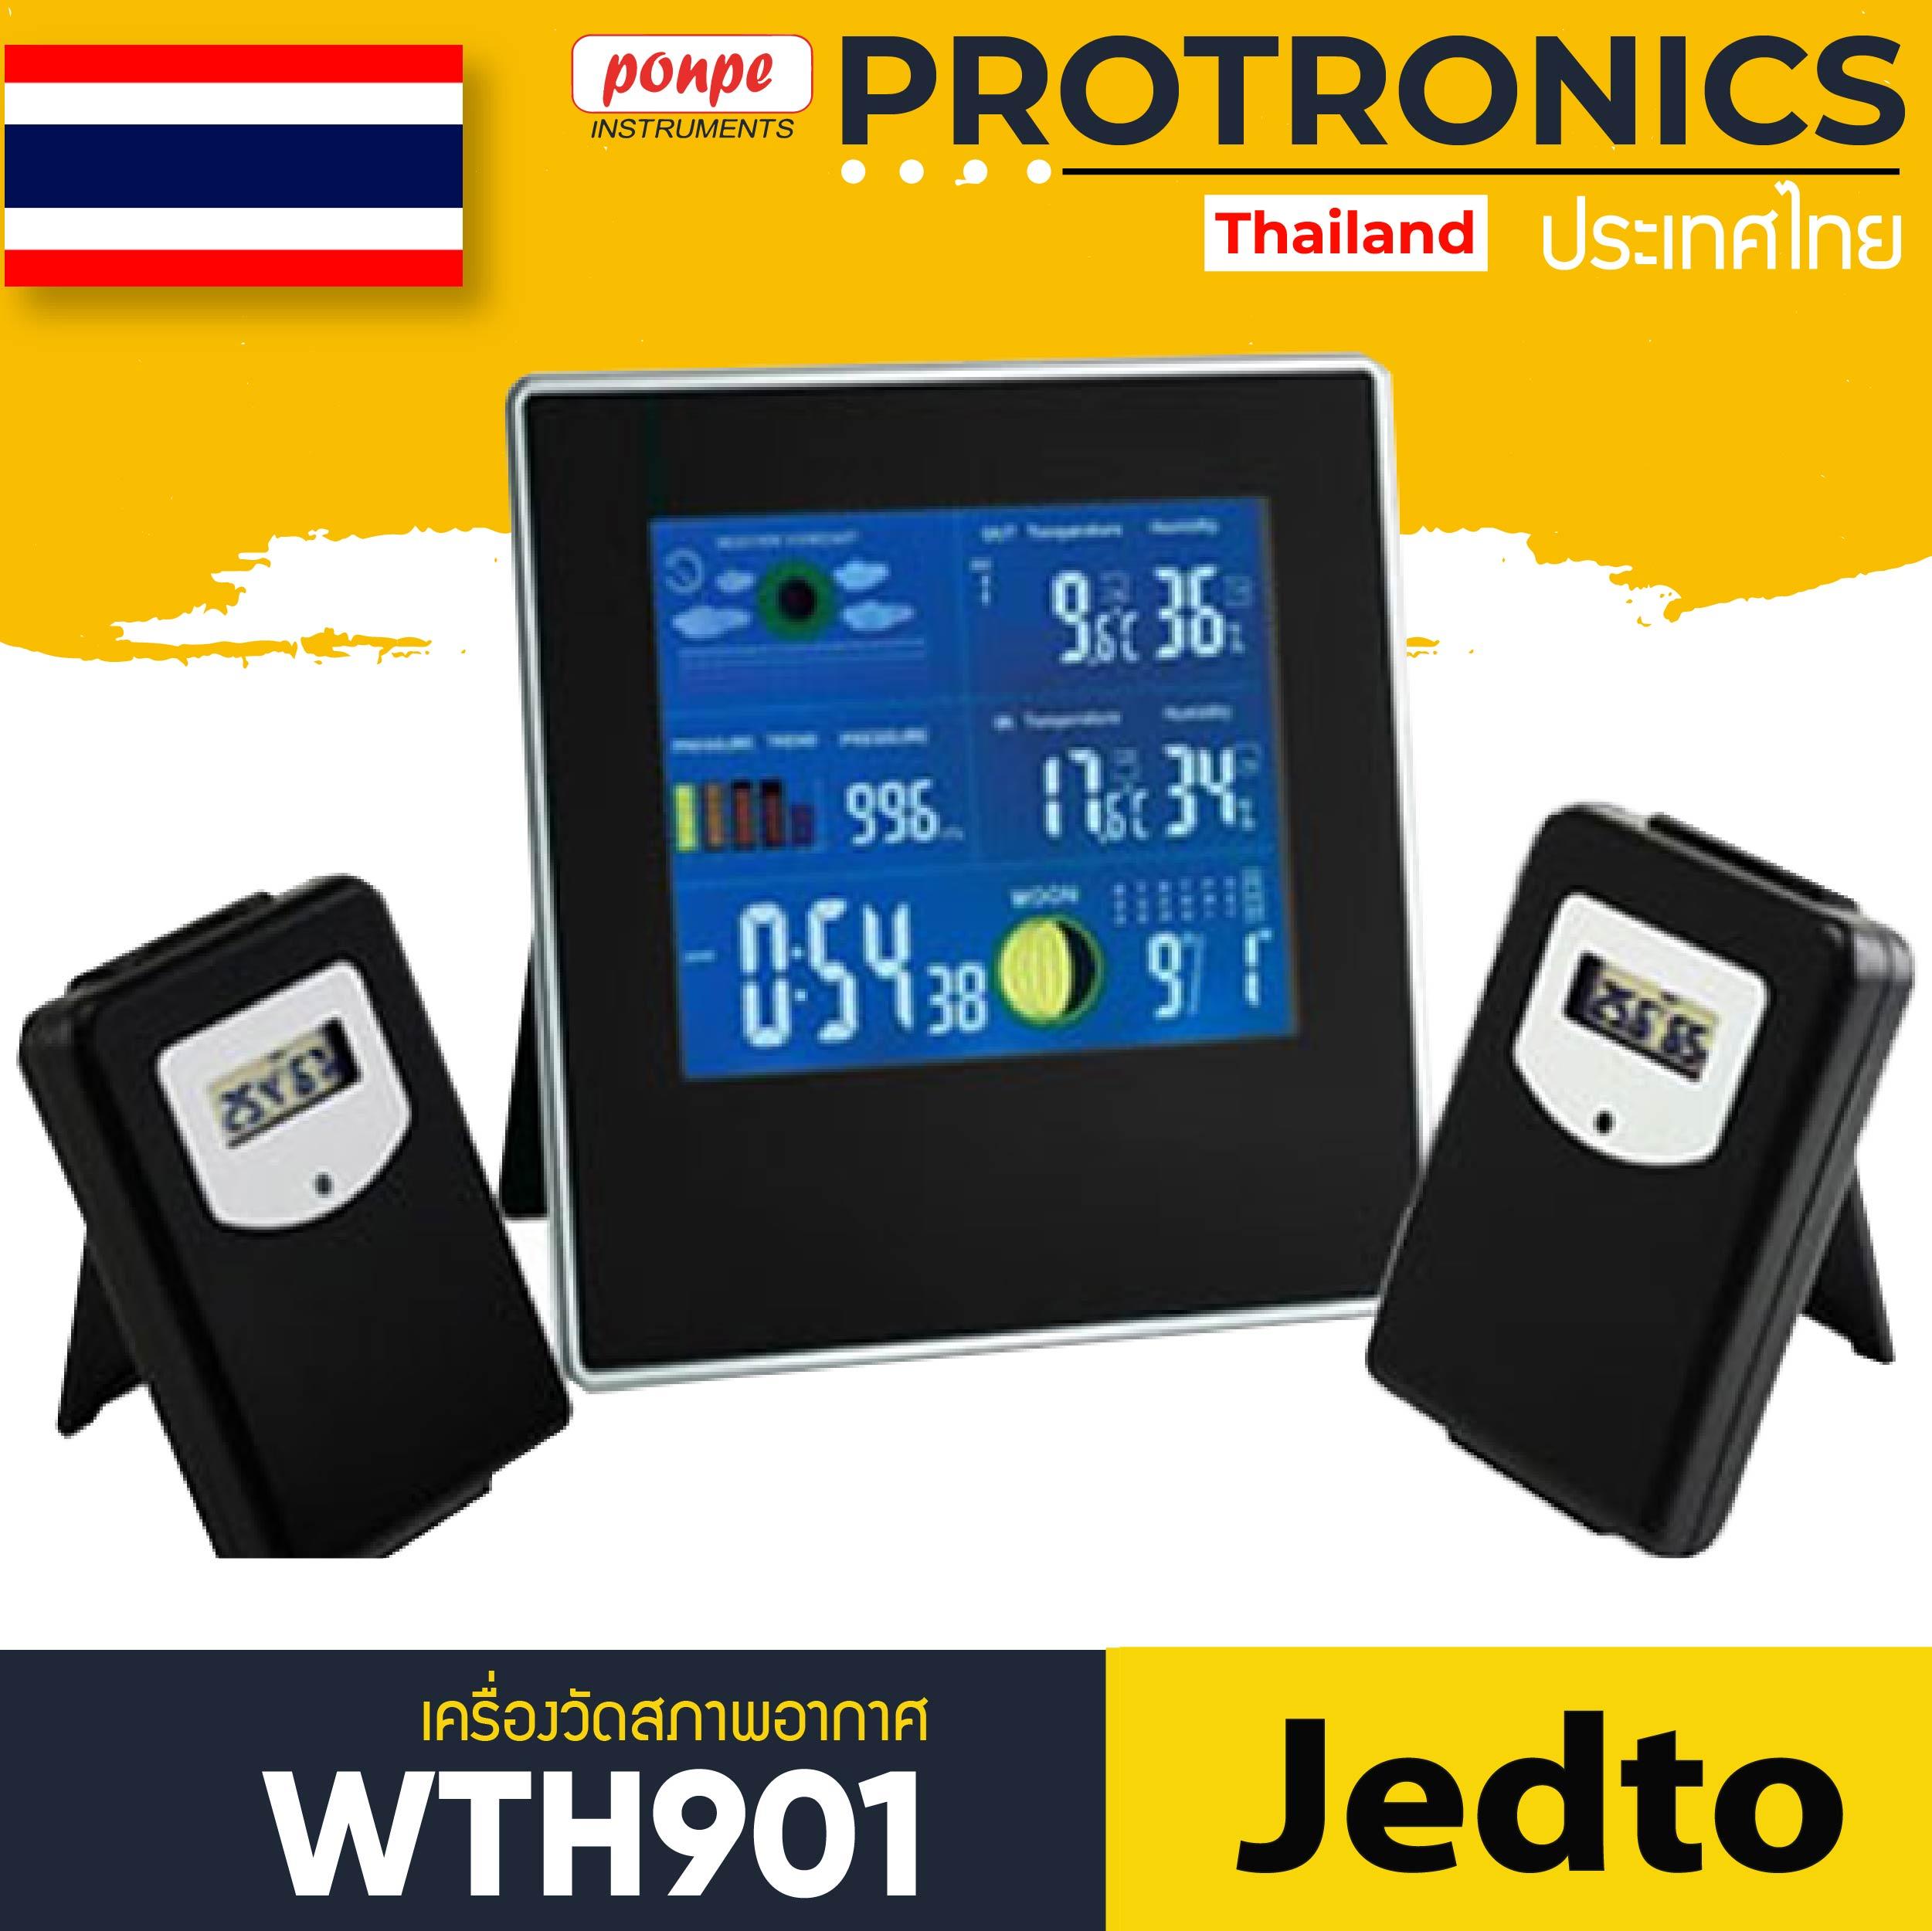 WTH901 JEDTO เครื่องวัดสภาพอากาศ Weather Station